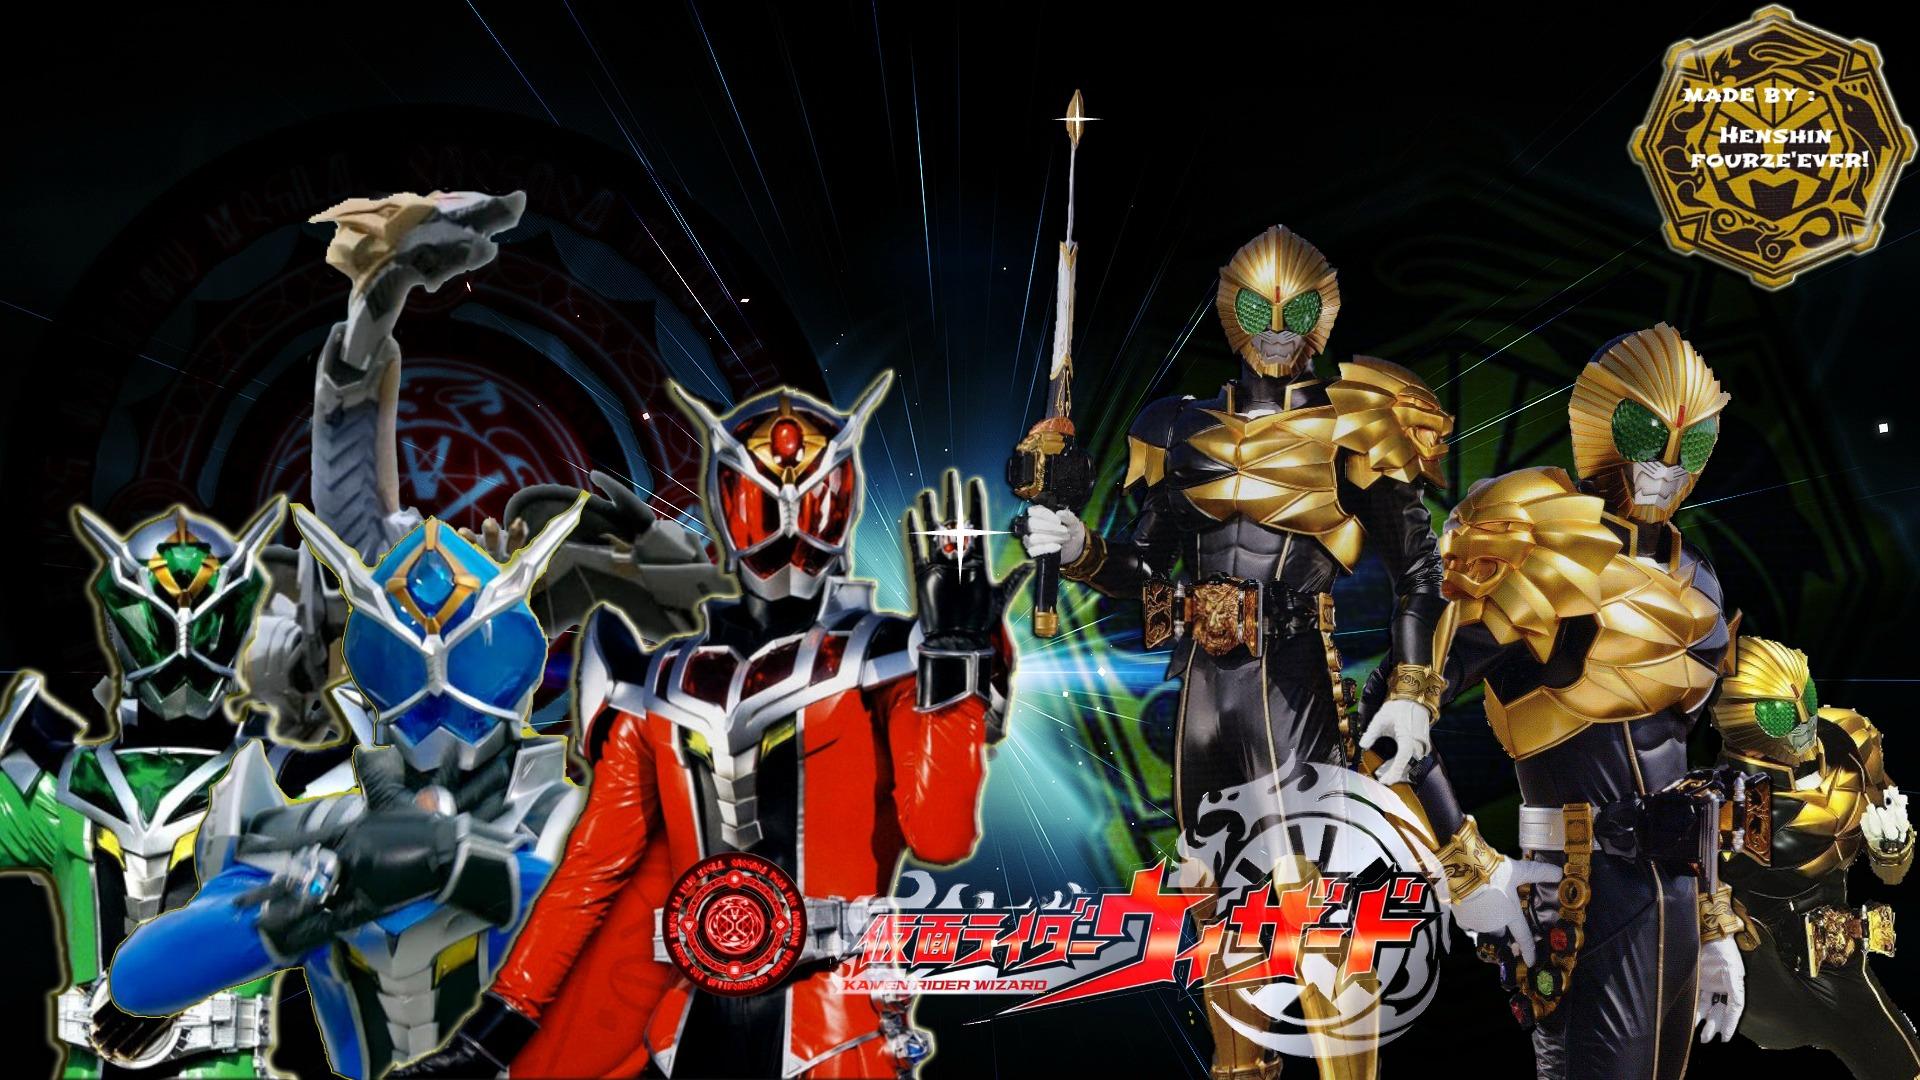 Kamen Rider Wizard Wallpaper